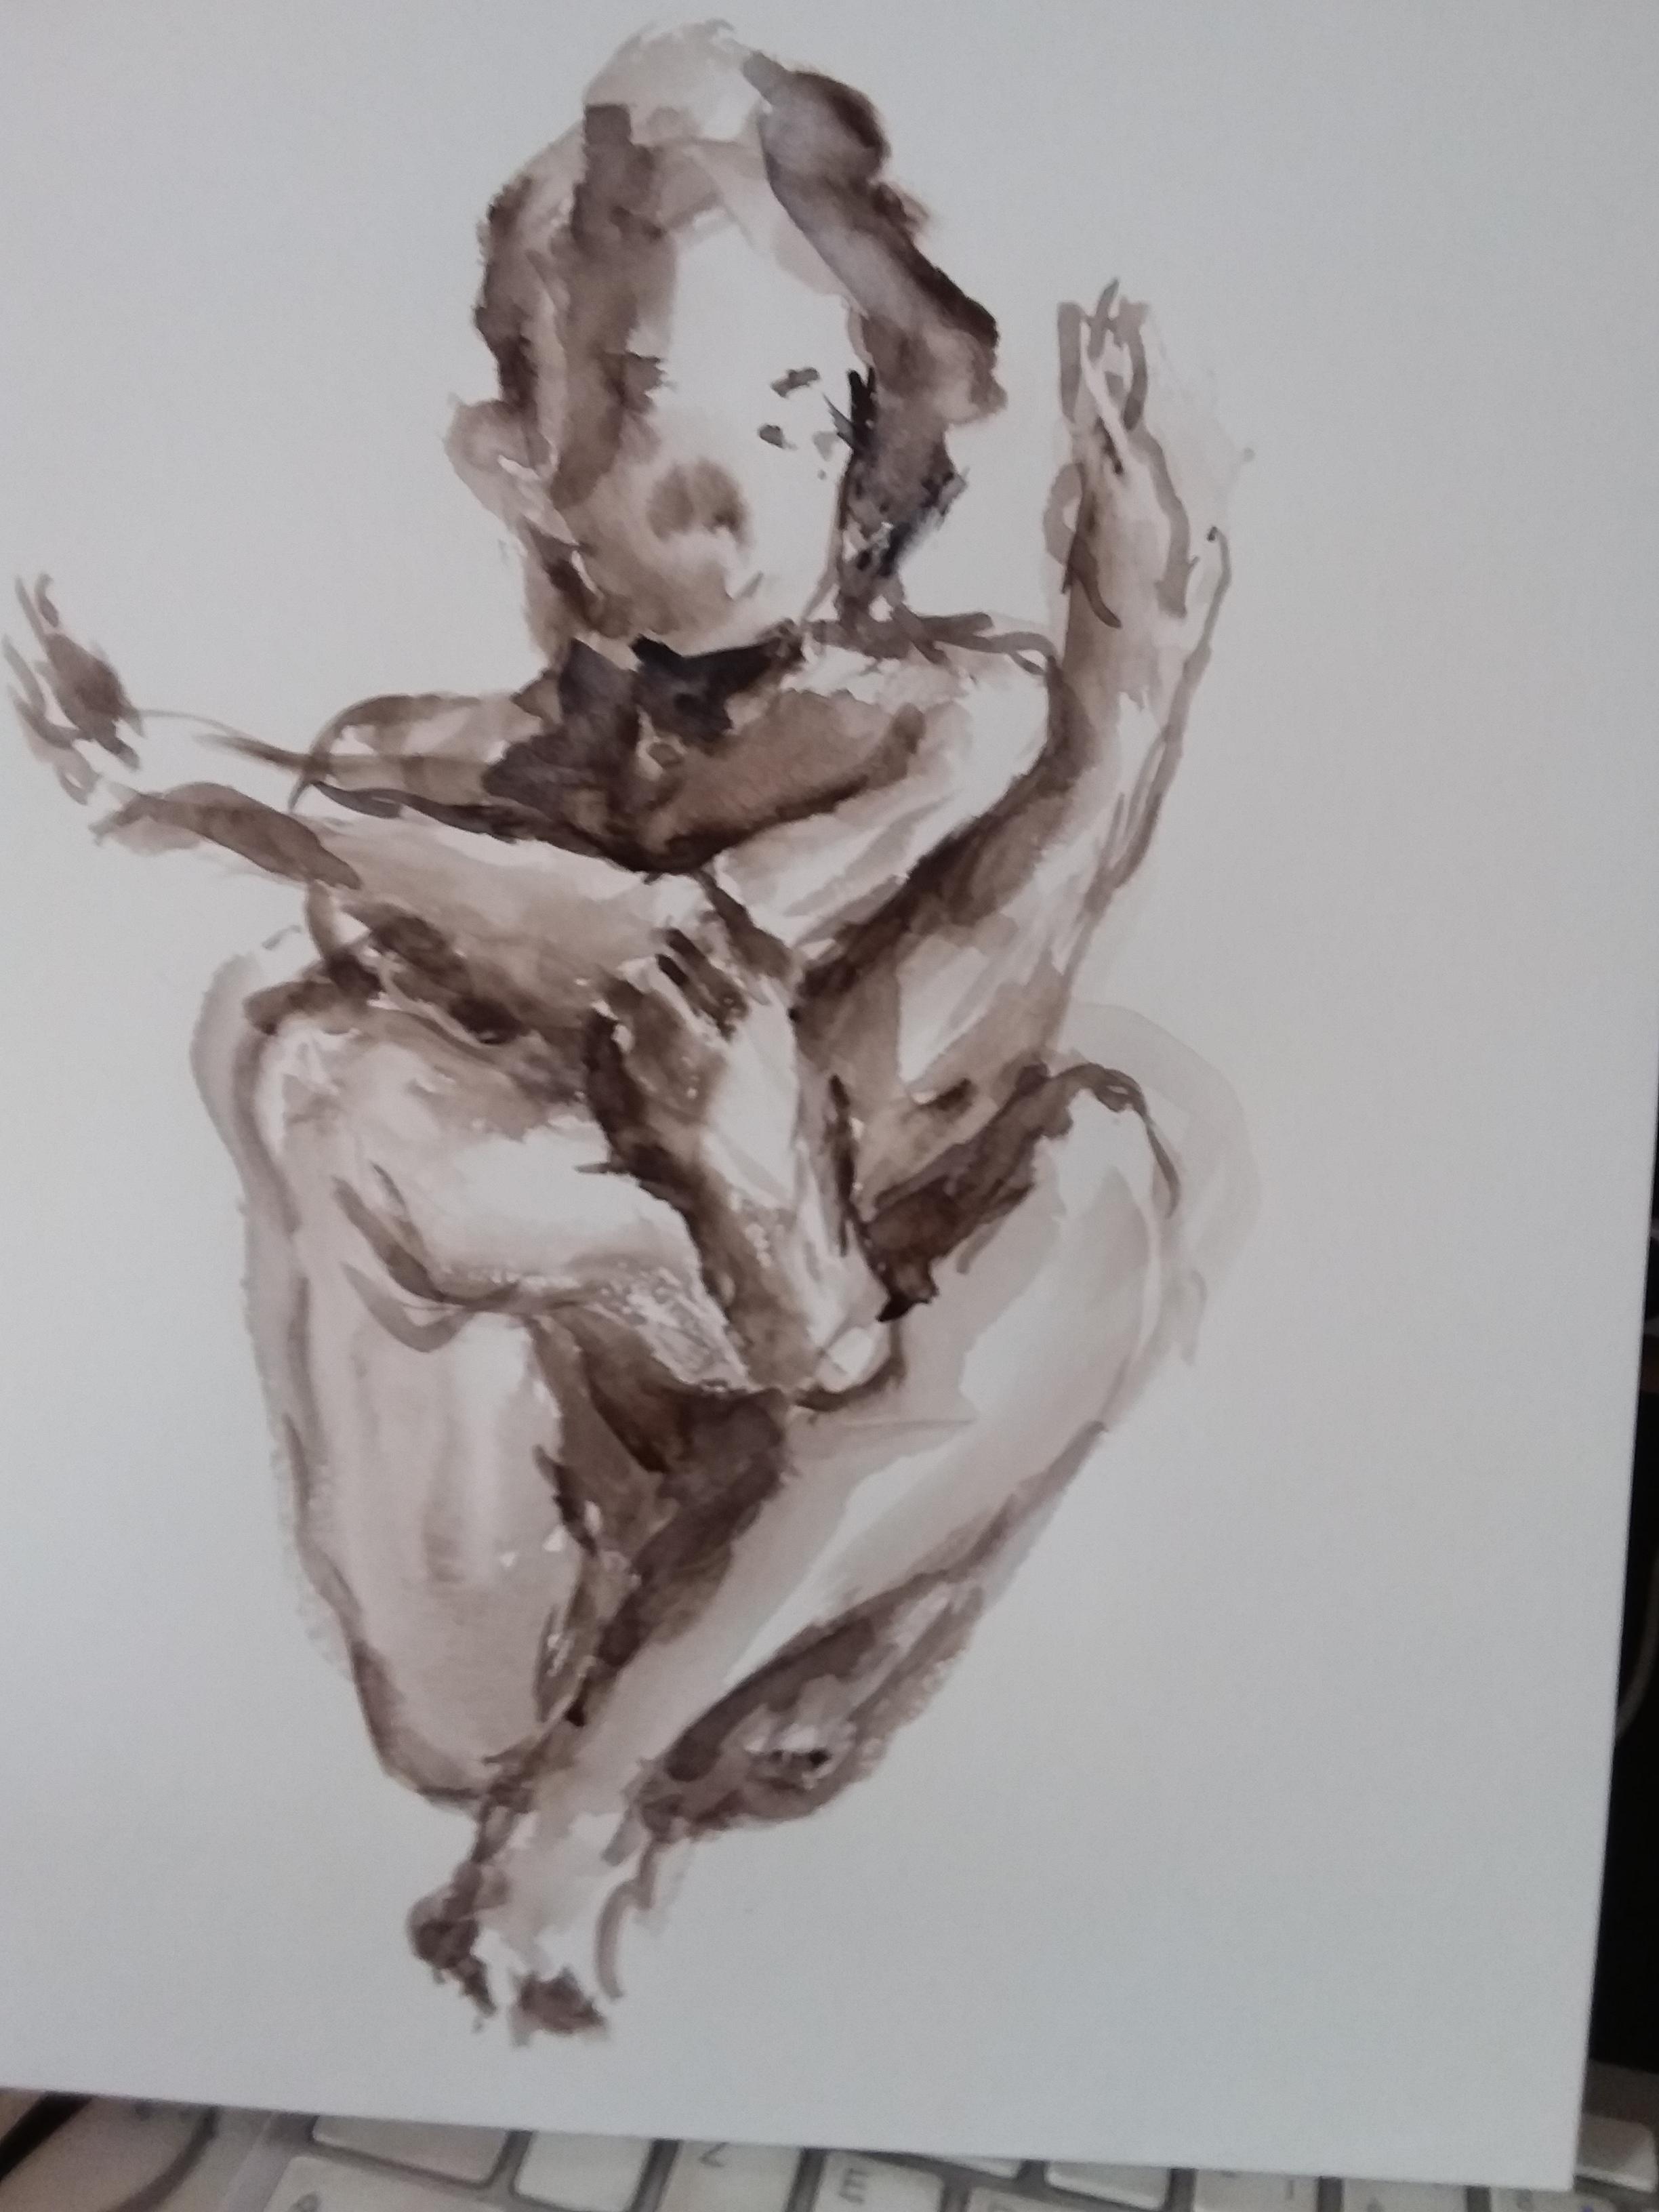 Dessin aquarelle pose regrouper camaïeu  cours de dessin